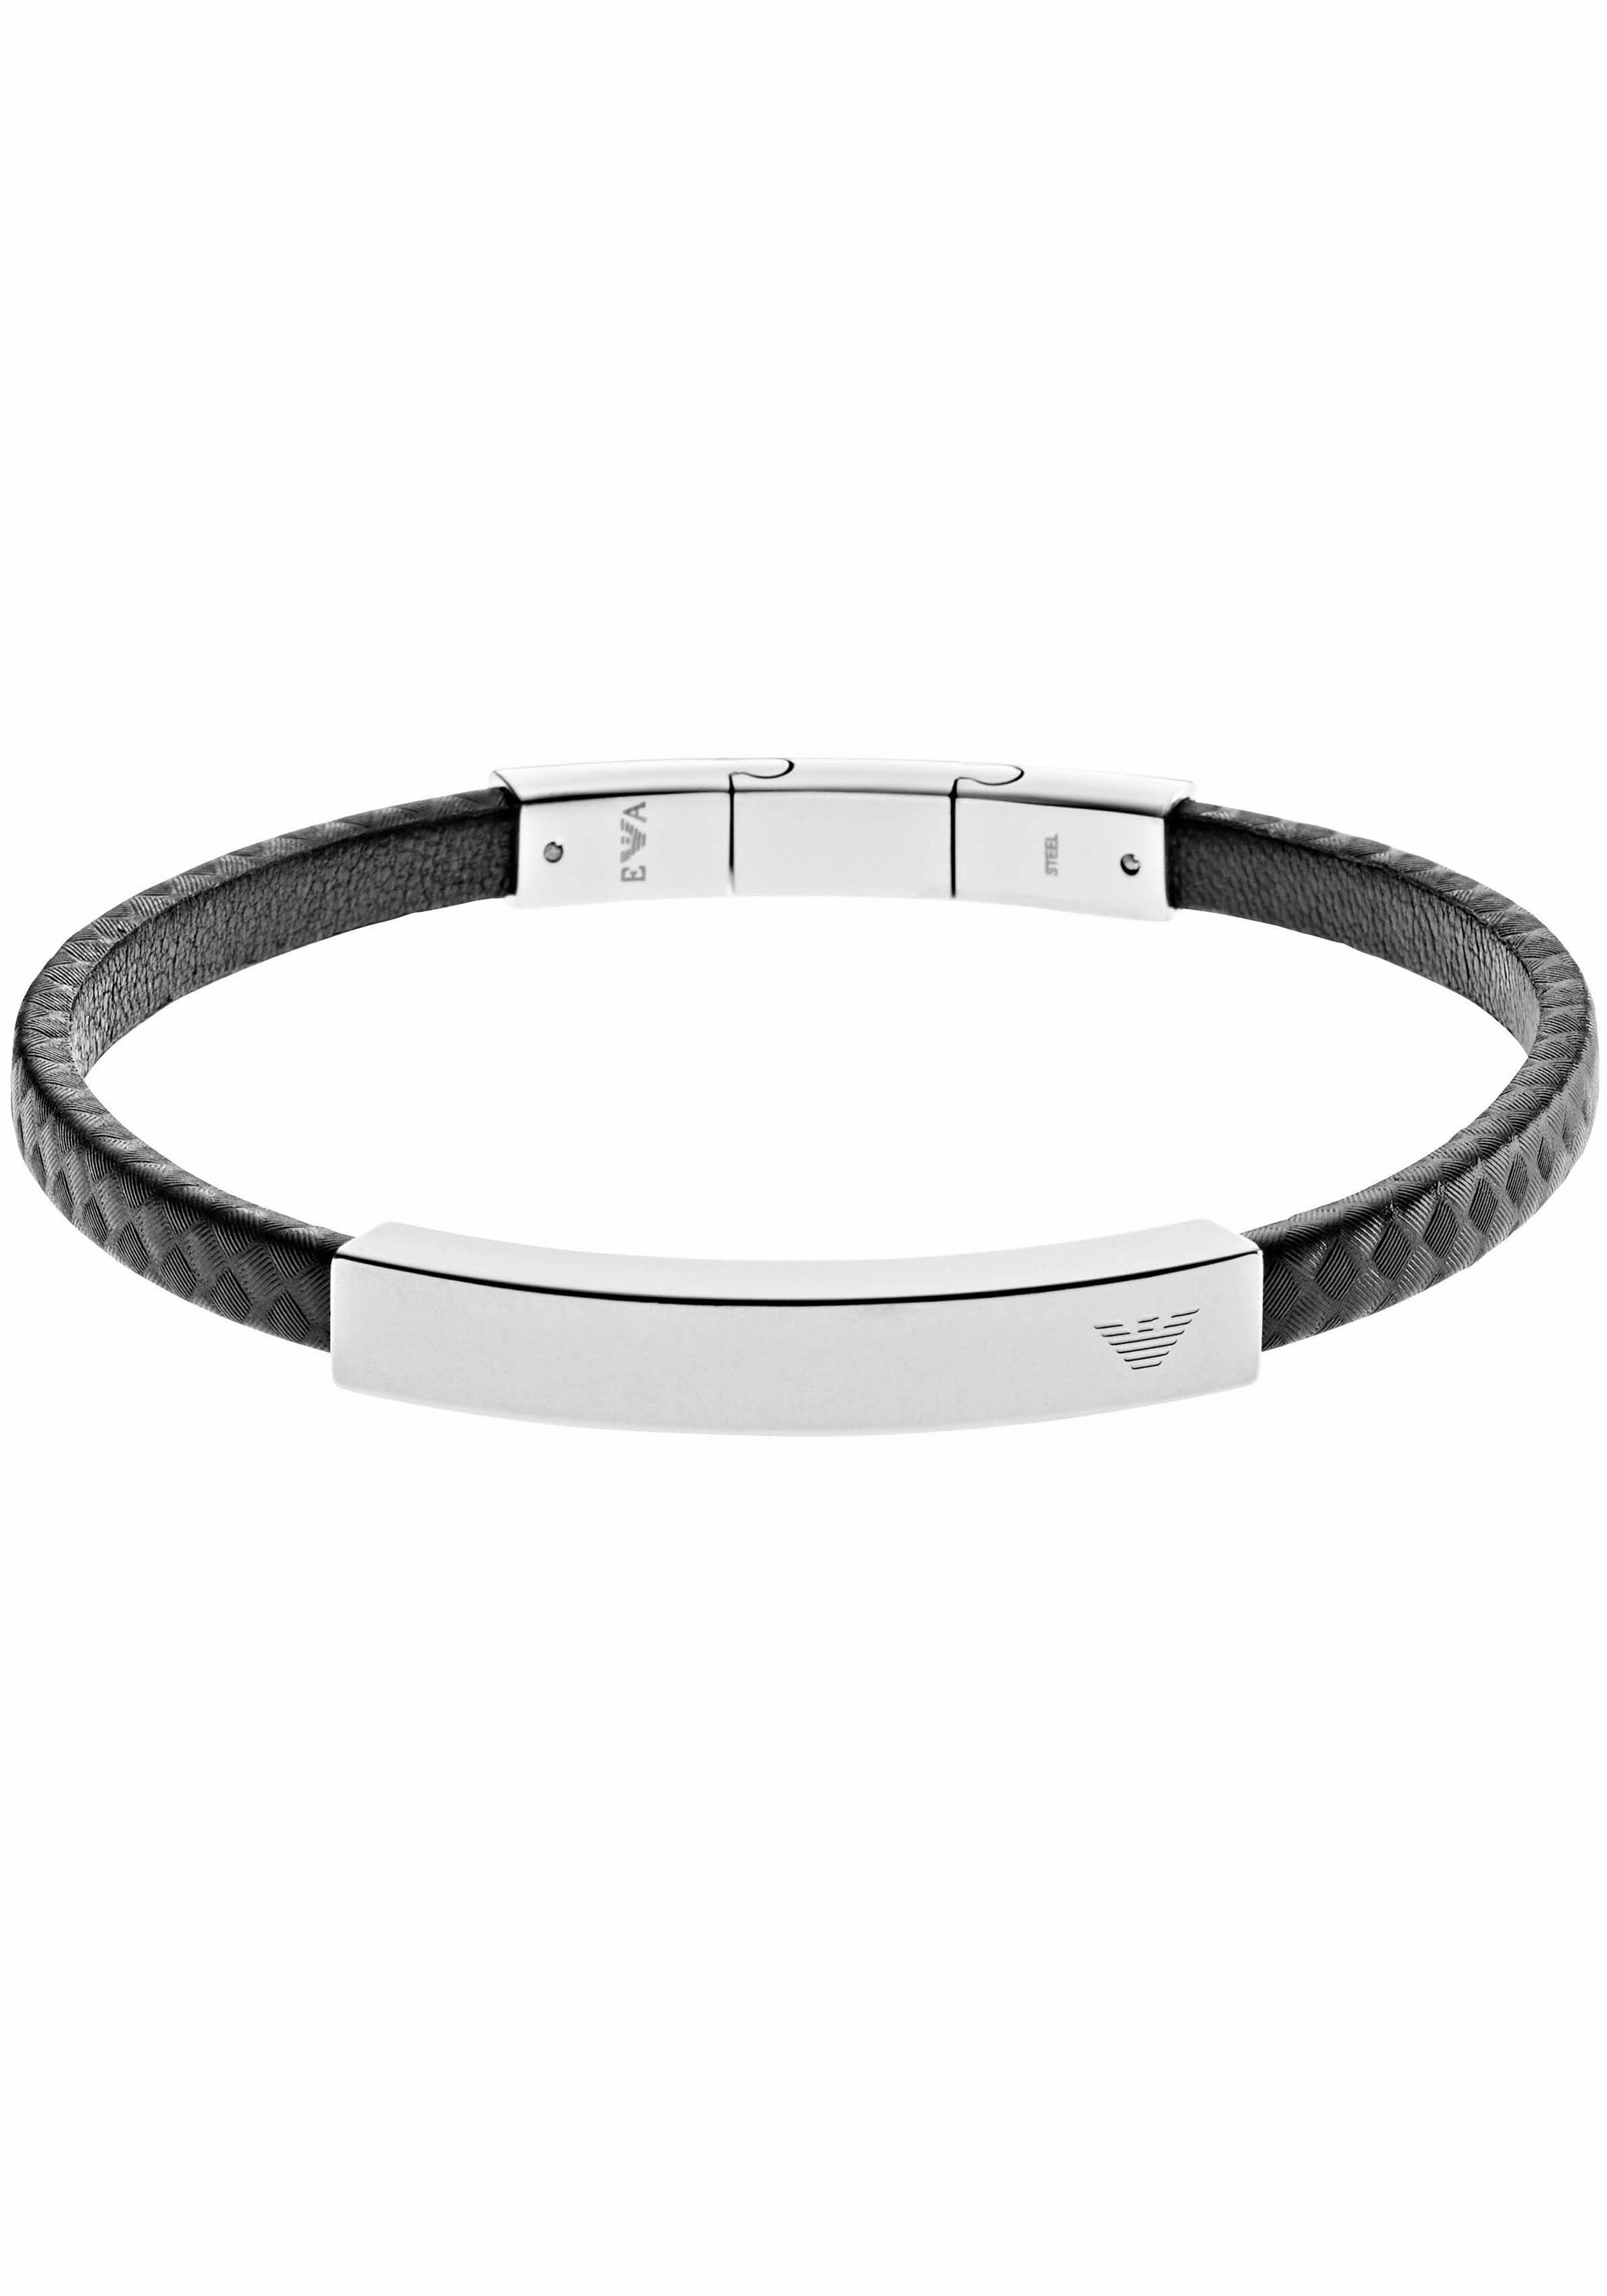 Emporio Armani Armband EGS2063040 | Schmuck | Emporio Armani